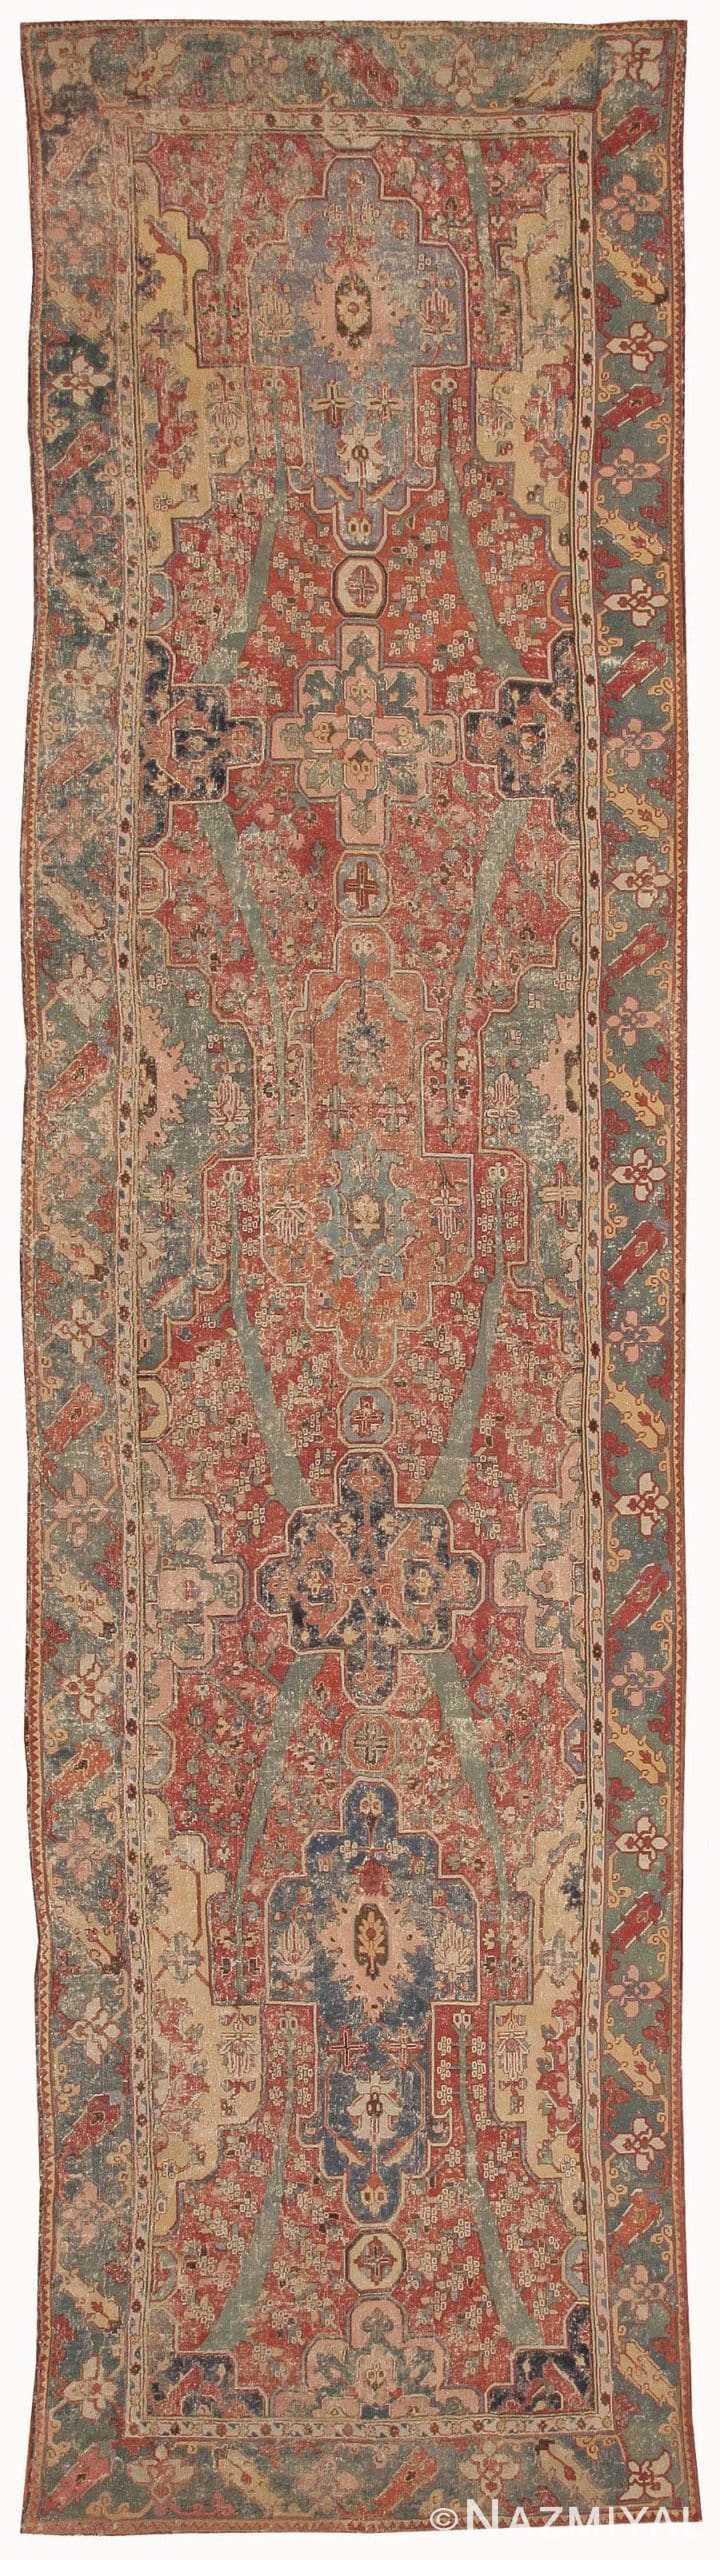 Antique 18th Century Khorassan Persian Rug 3289 Nazmiyal